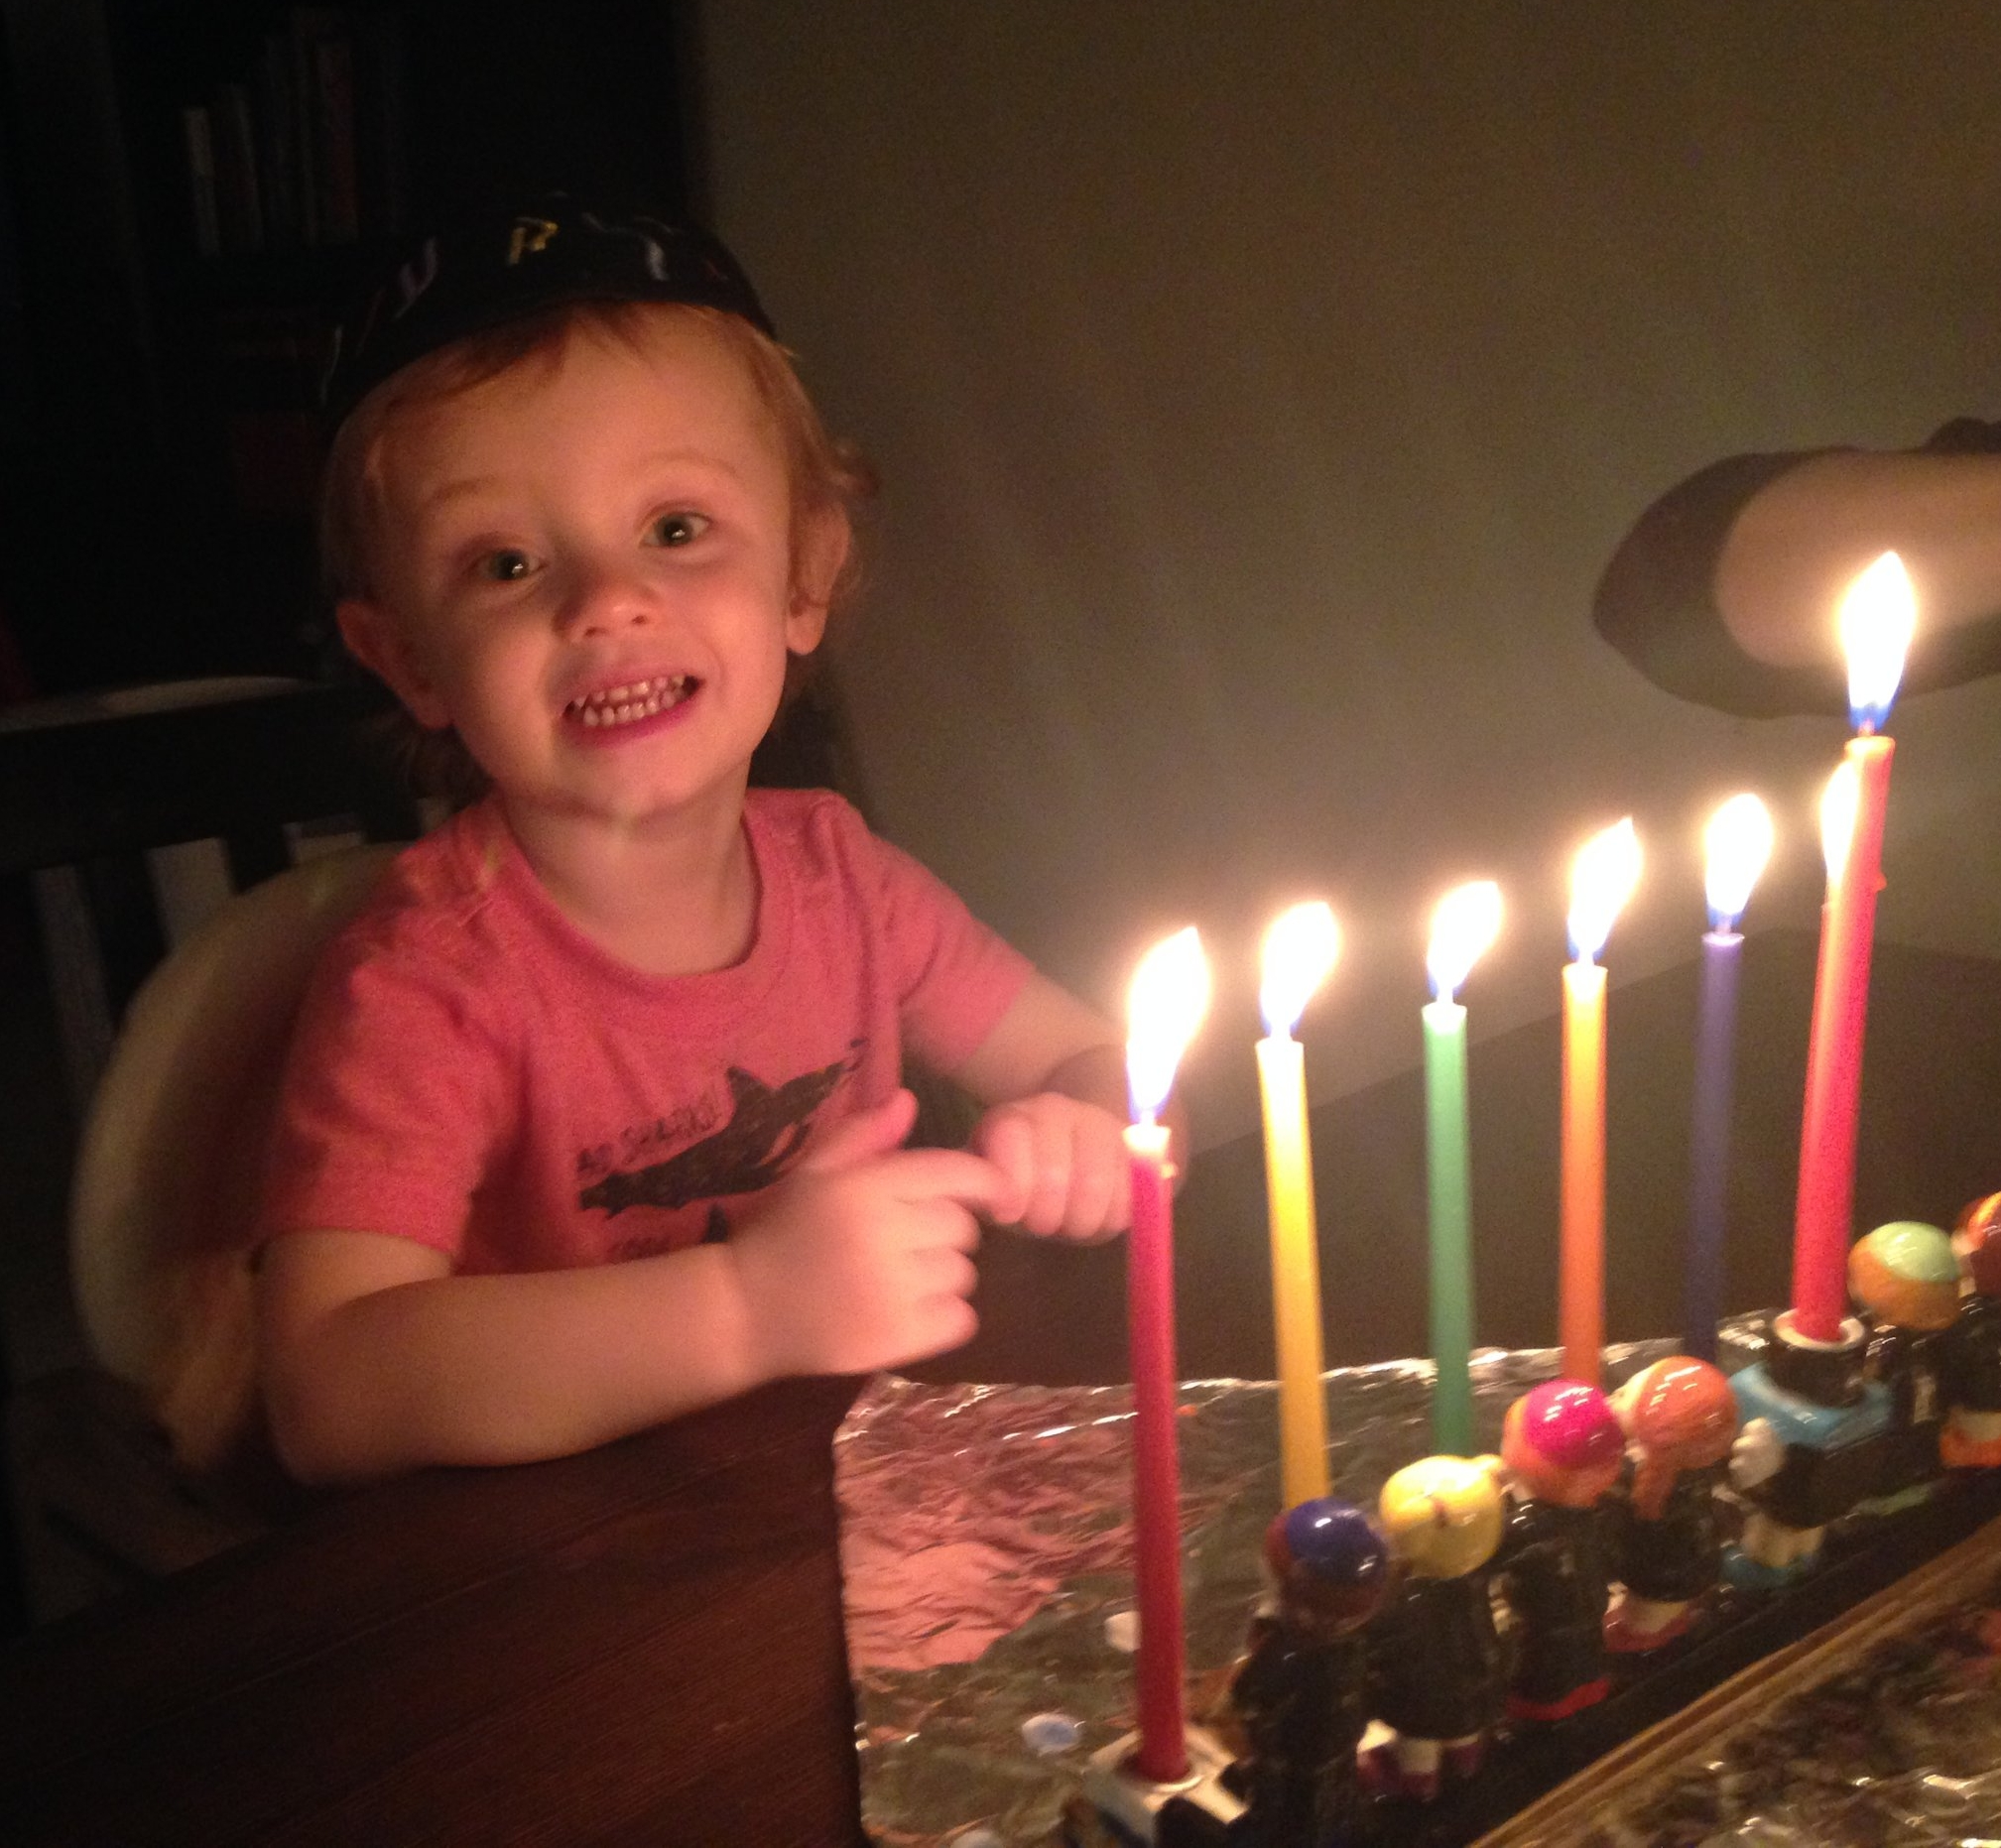 my little guy enjoying his second Hanukkah